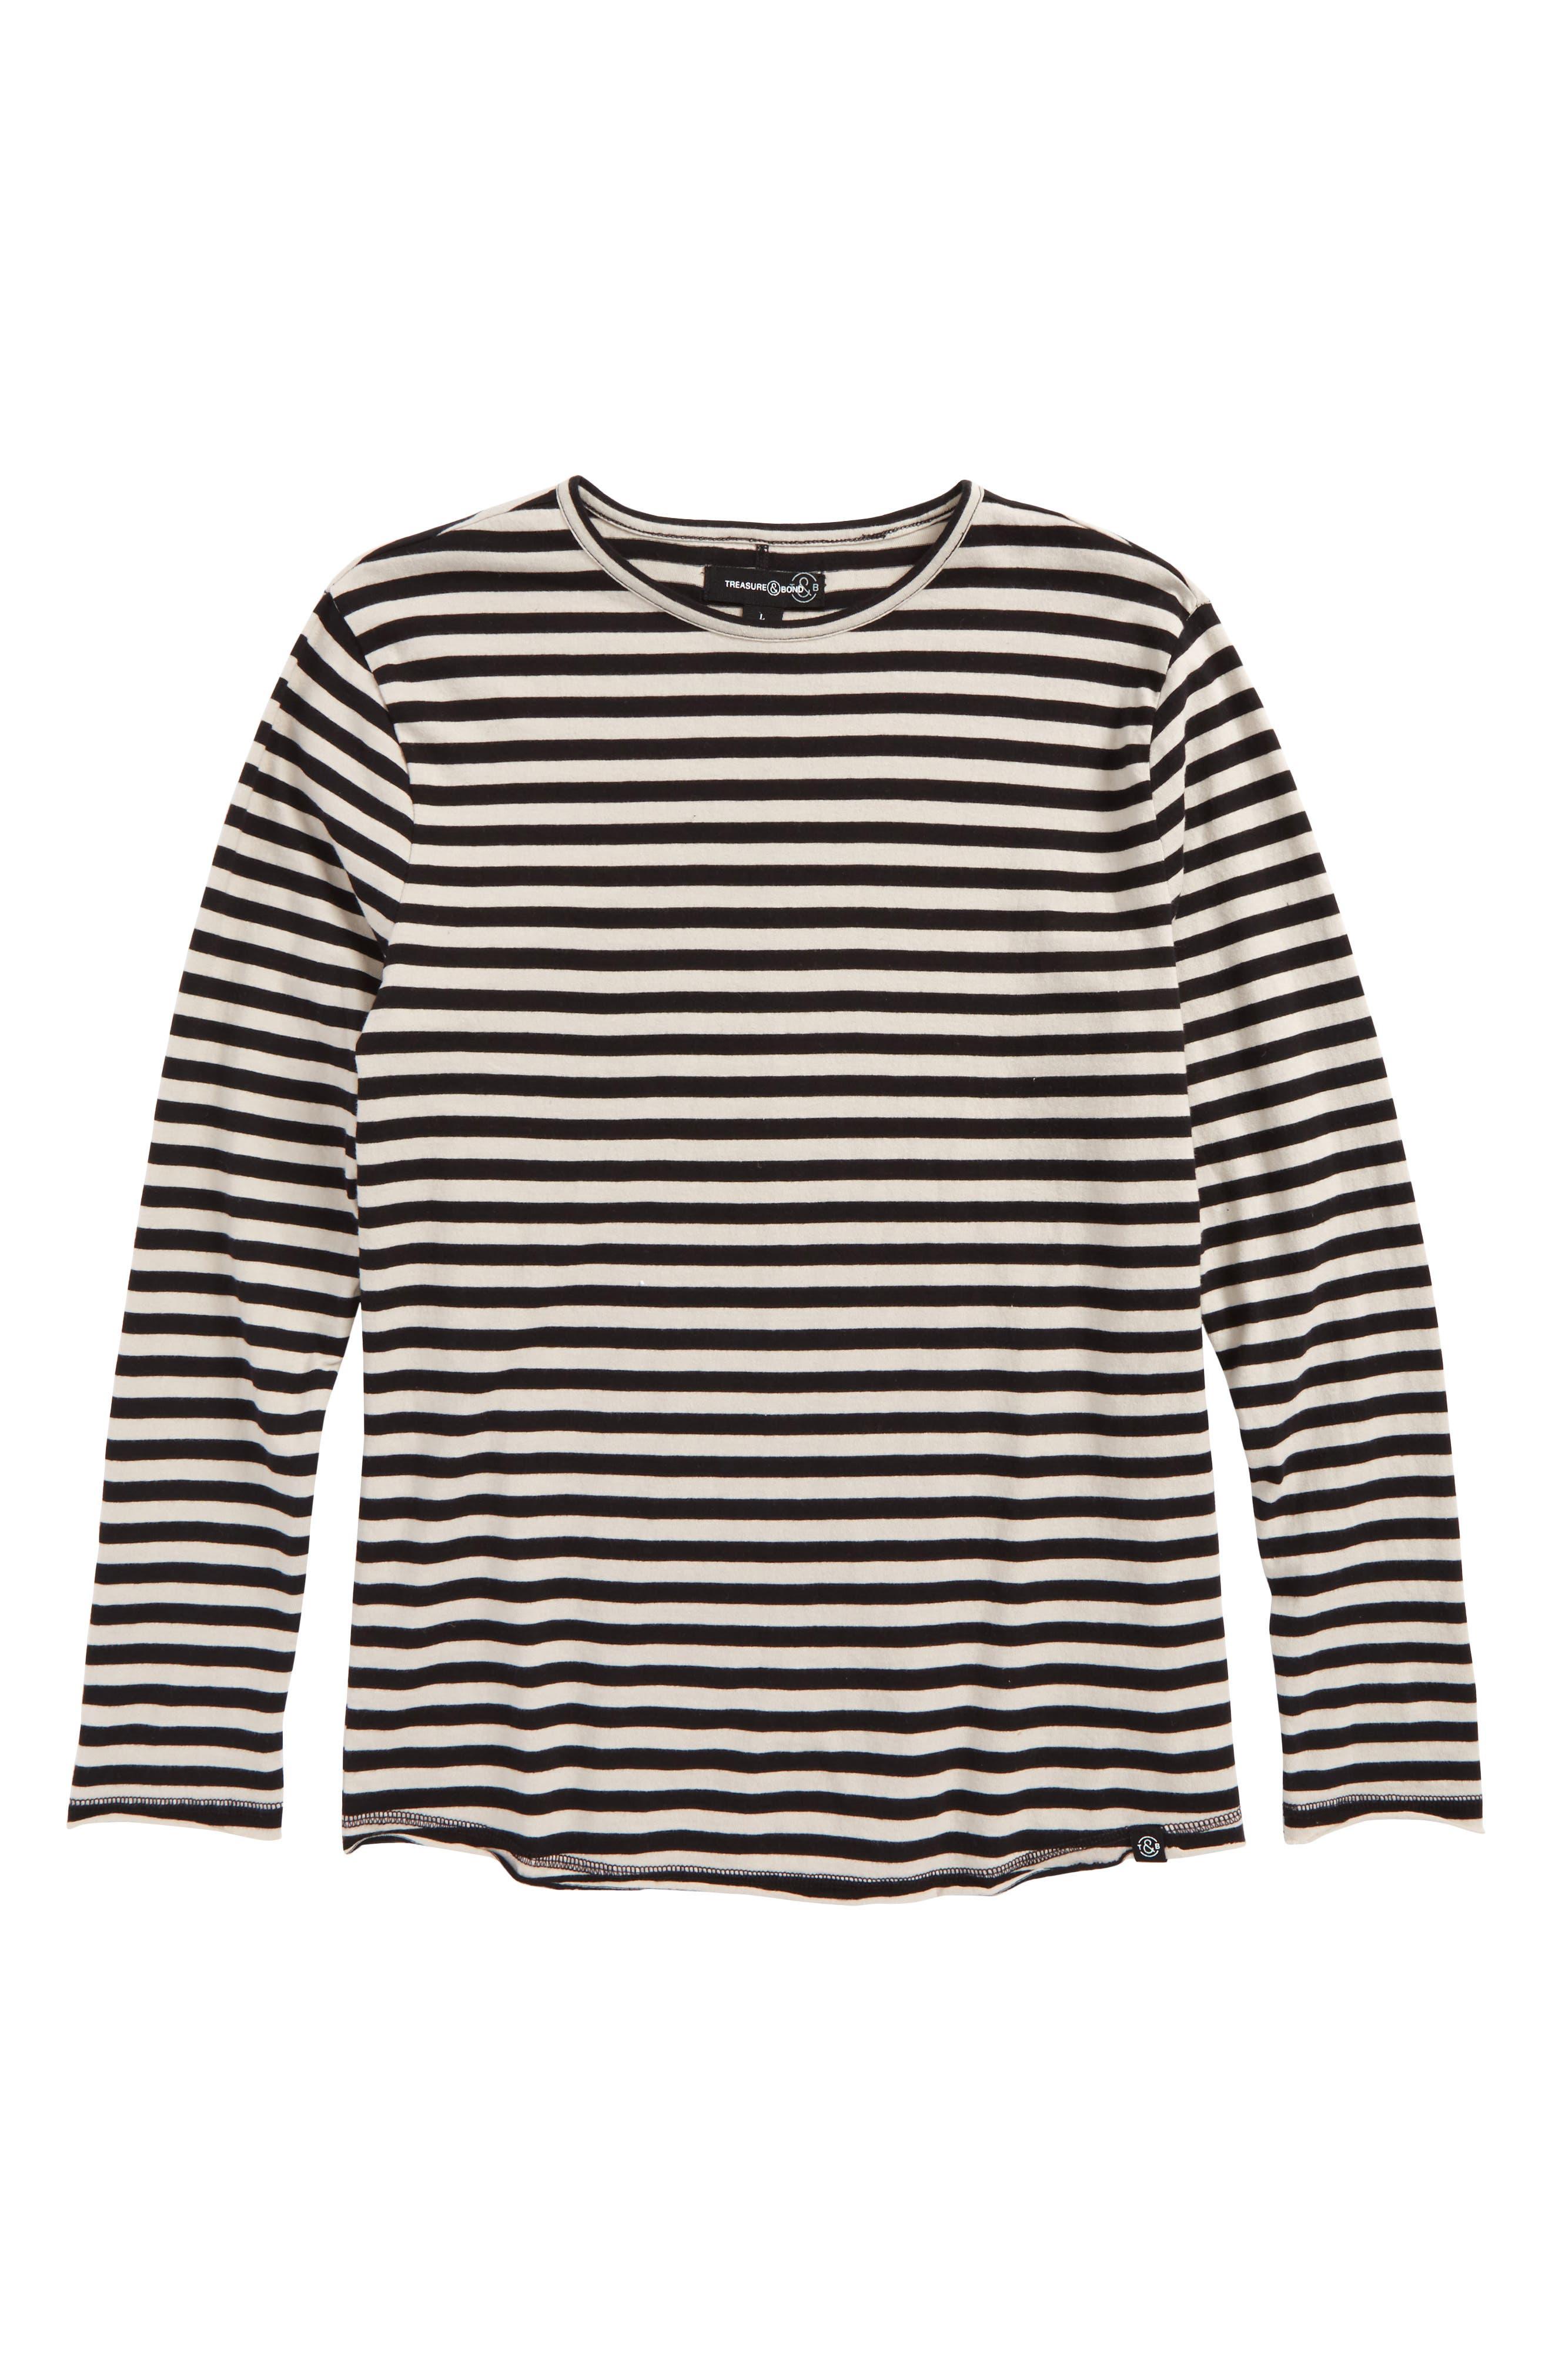 Main Image - Treasure & Bond Stripe T-Shirt (Big Boys)